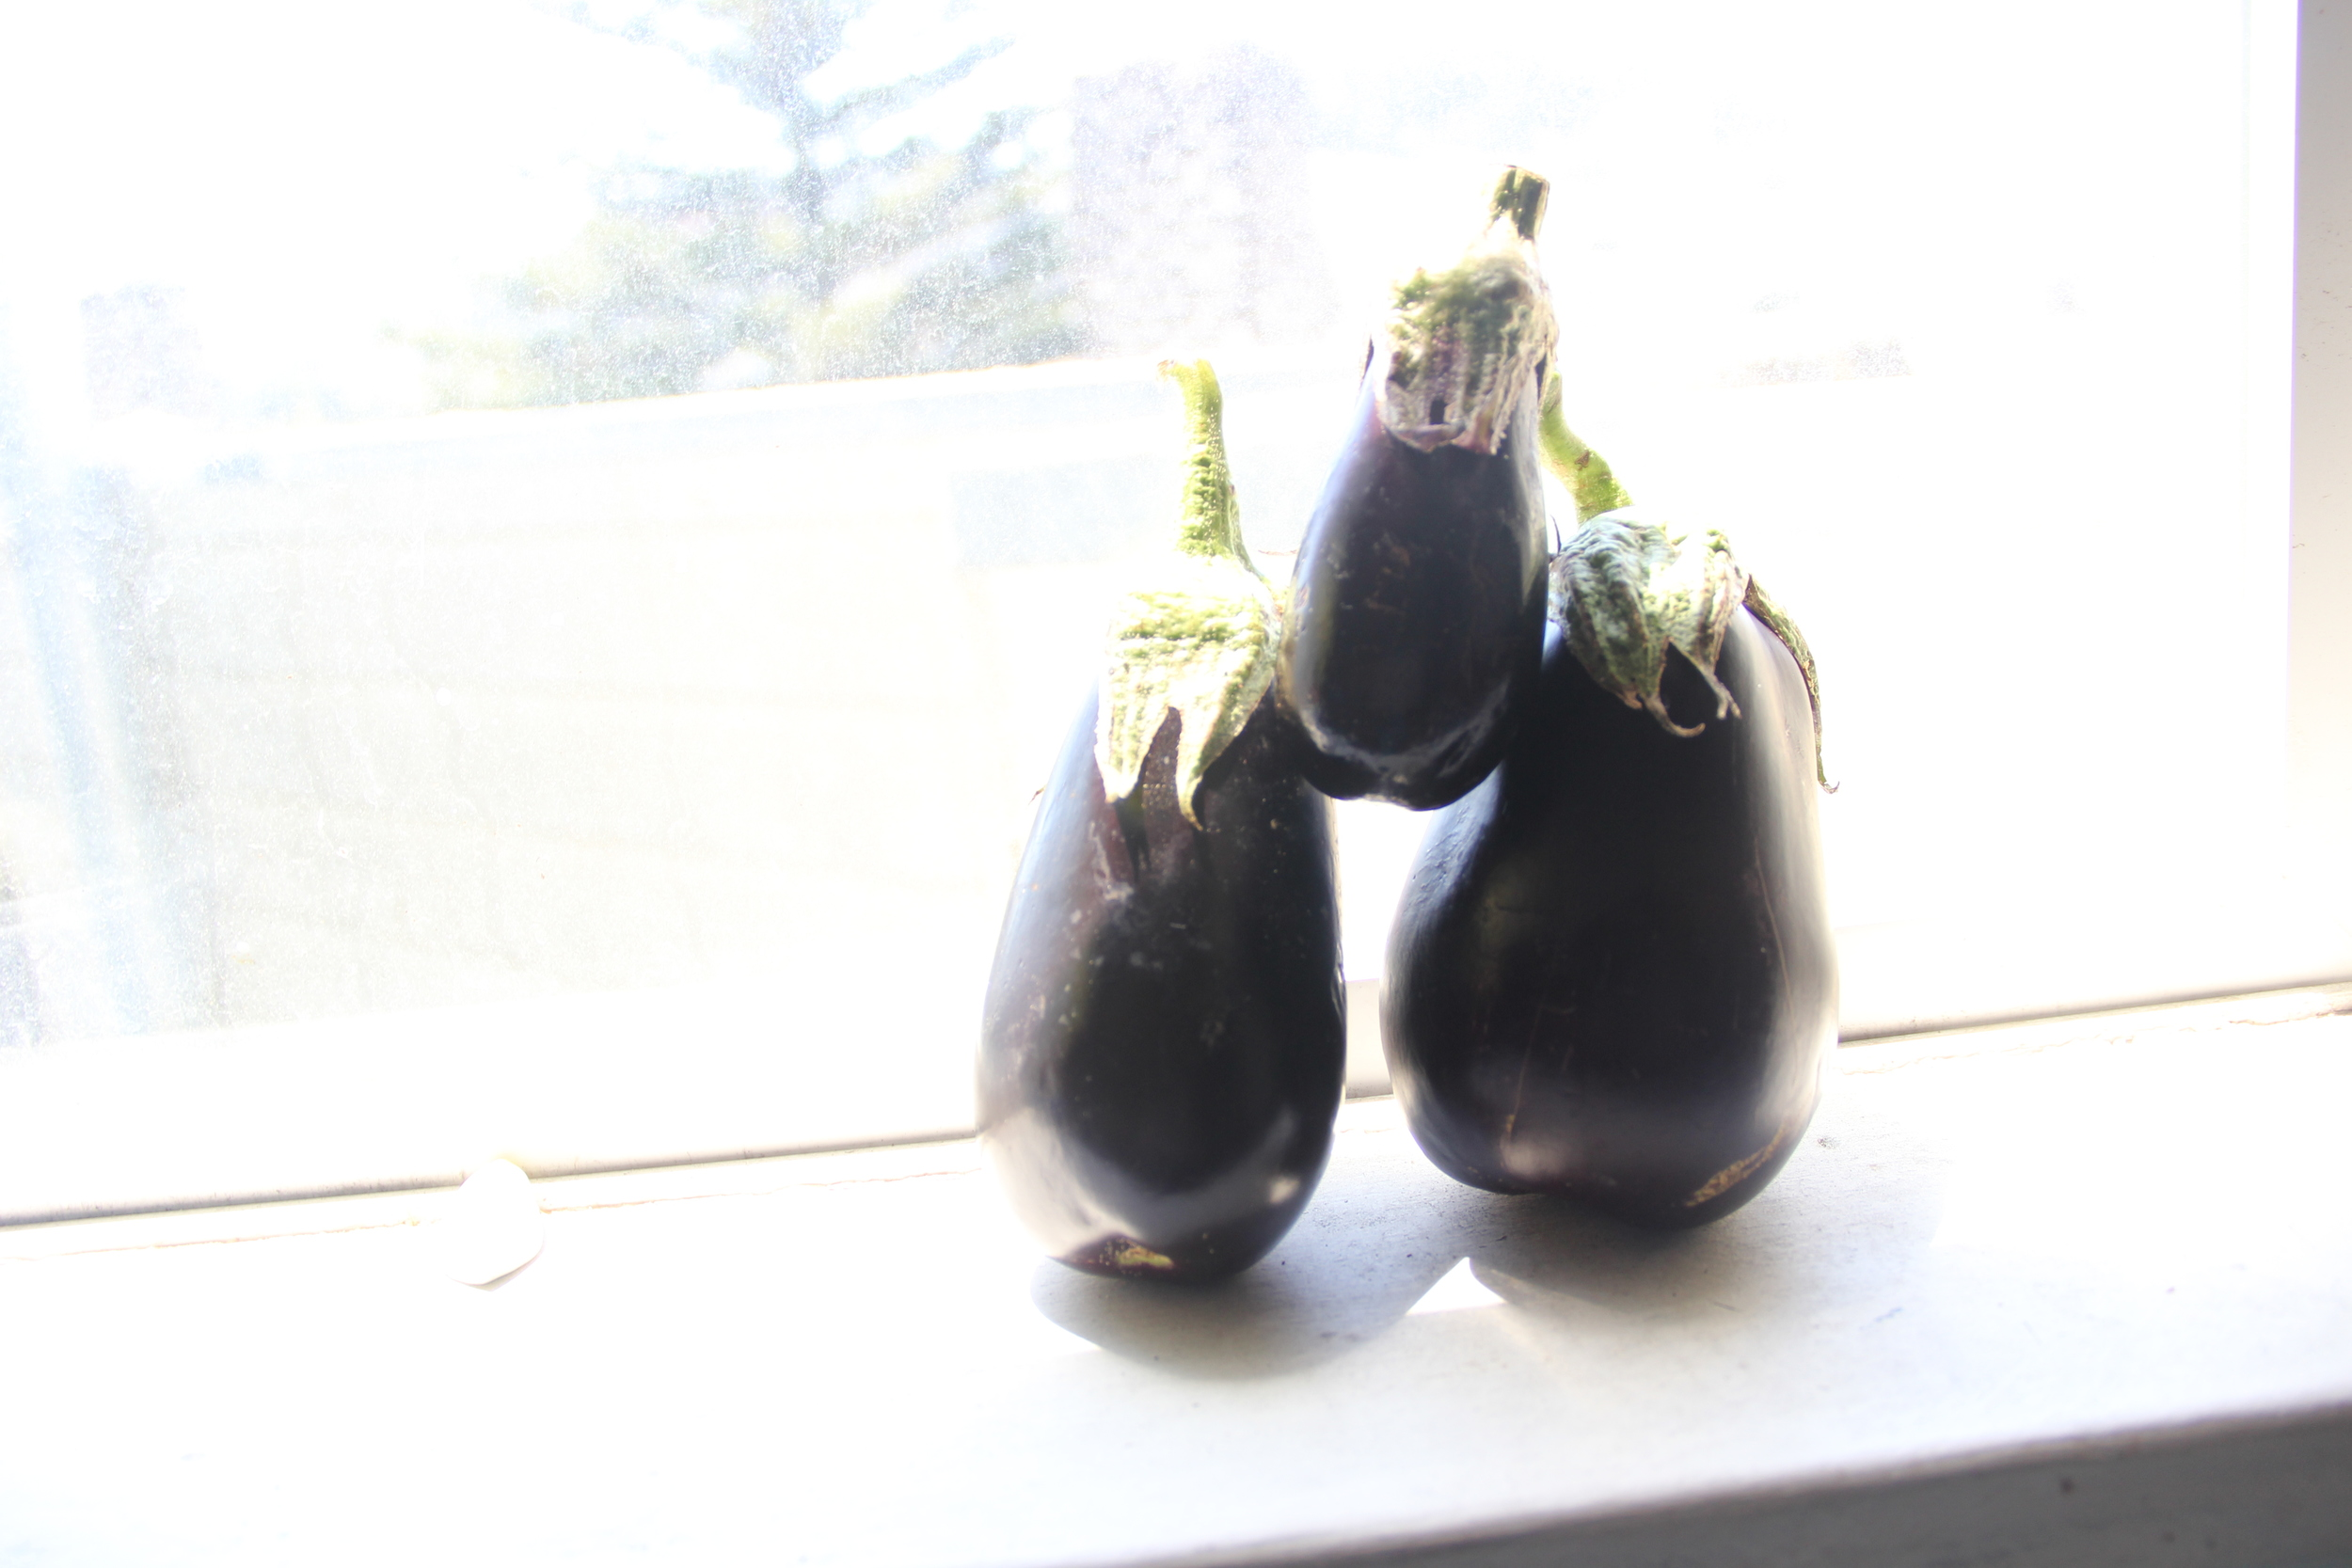 Eggplant, enjoying the San Francisco view.